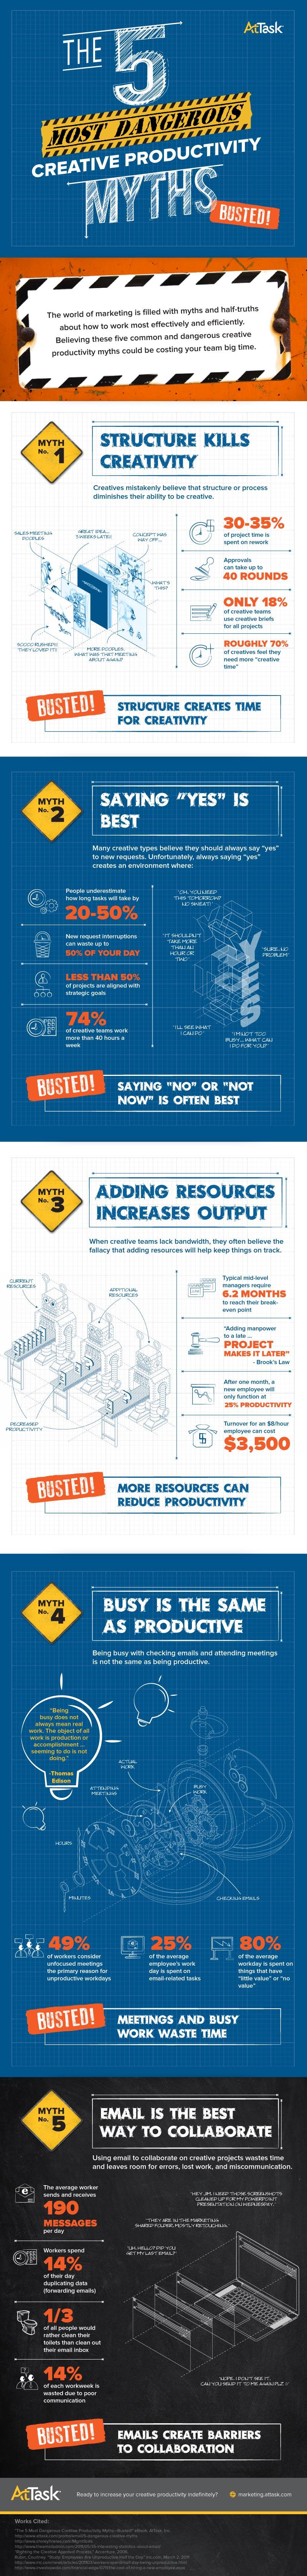 productivity myths infographic